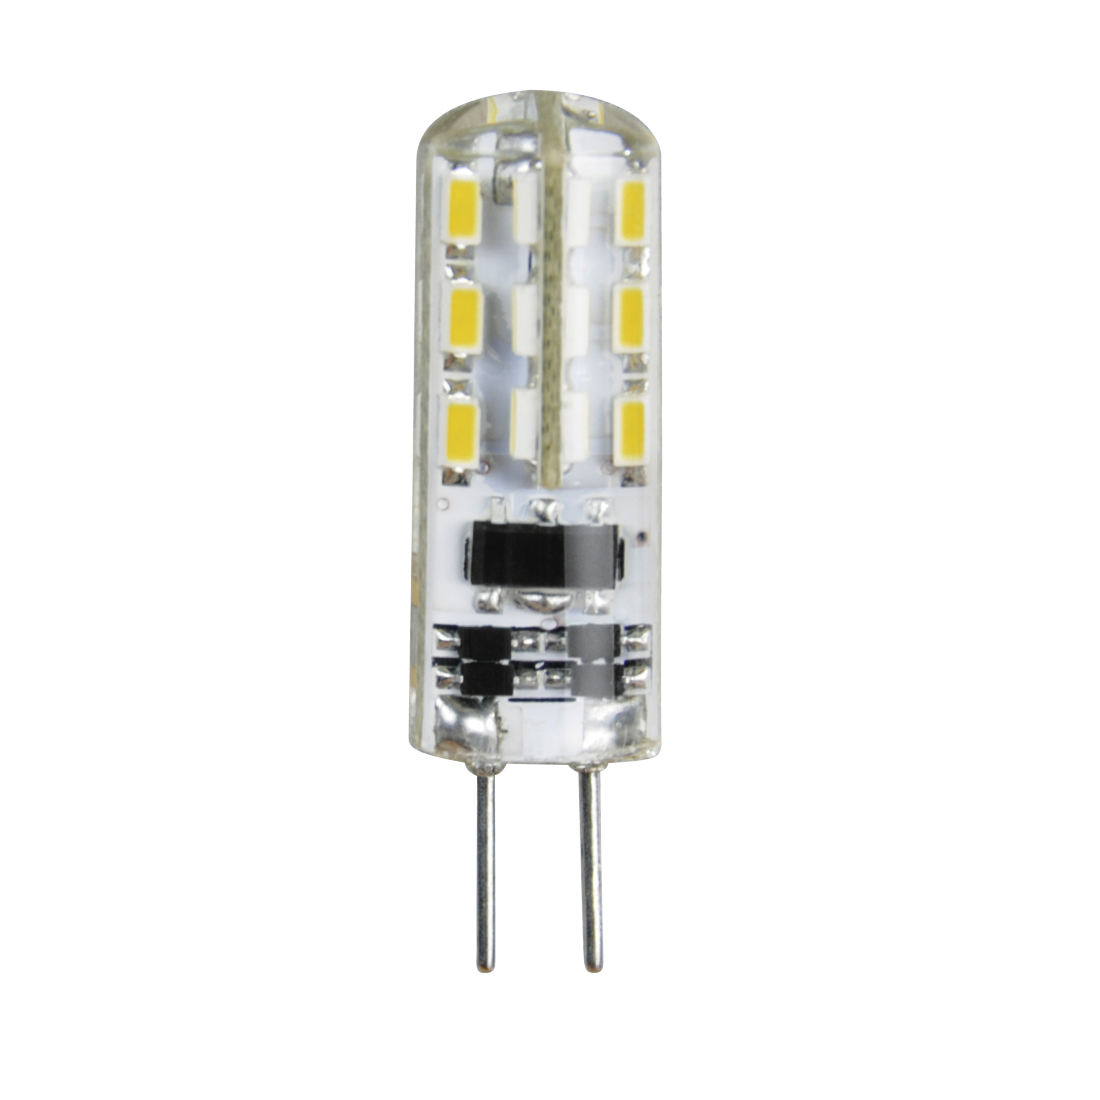 xavax.eu   00112222 Xavax LED-Lampe, G4, 100lm ersetzt 11W ...